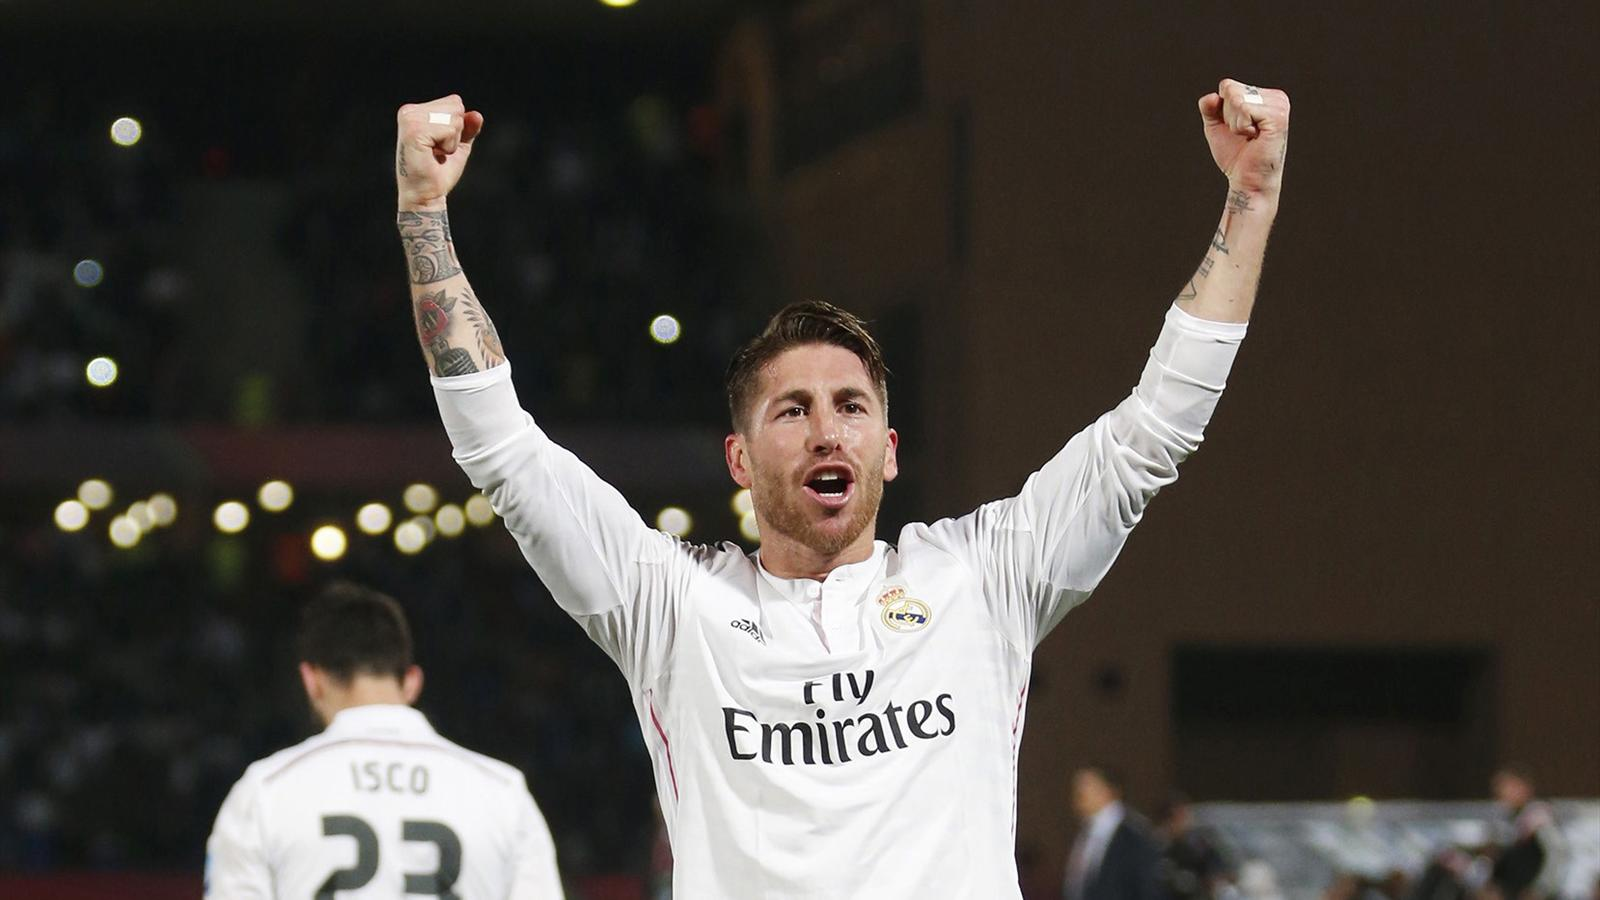 Sergio Ramos of Real Madrid celebrates after scoring against Mexico's Cruz Azul